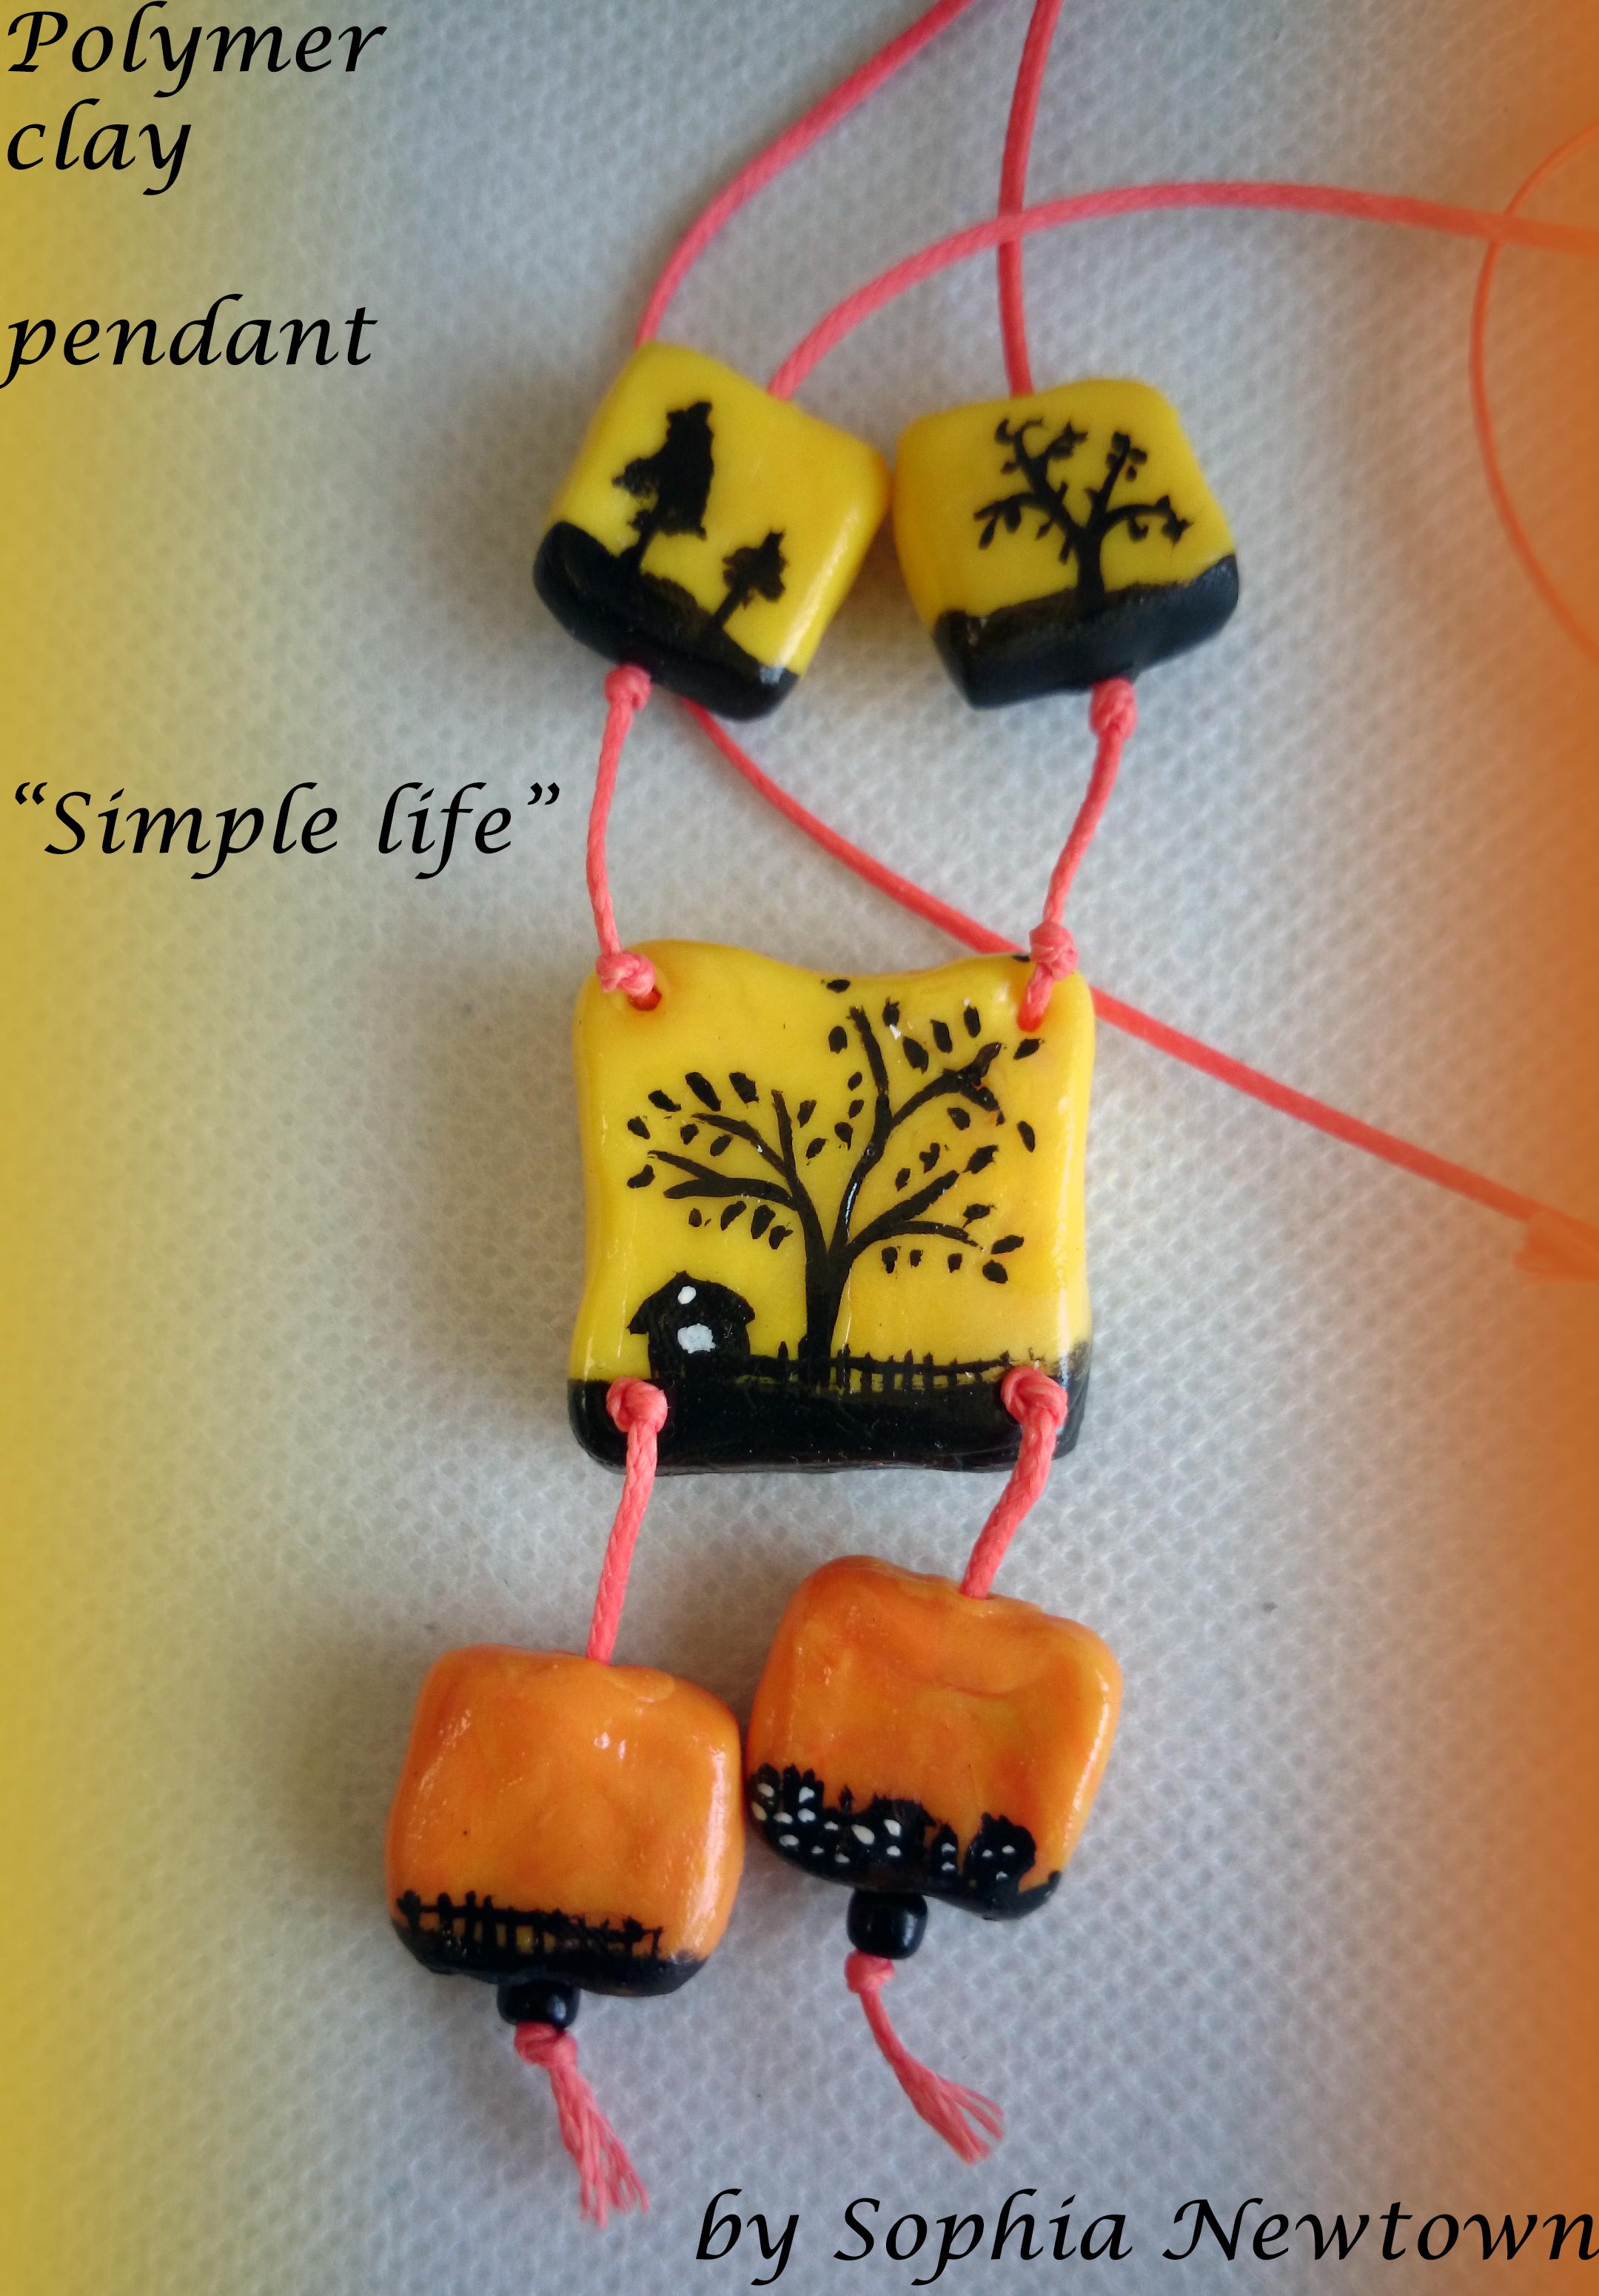 Simple life pendant